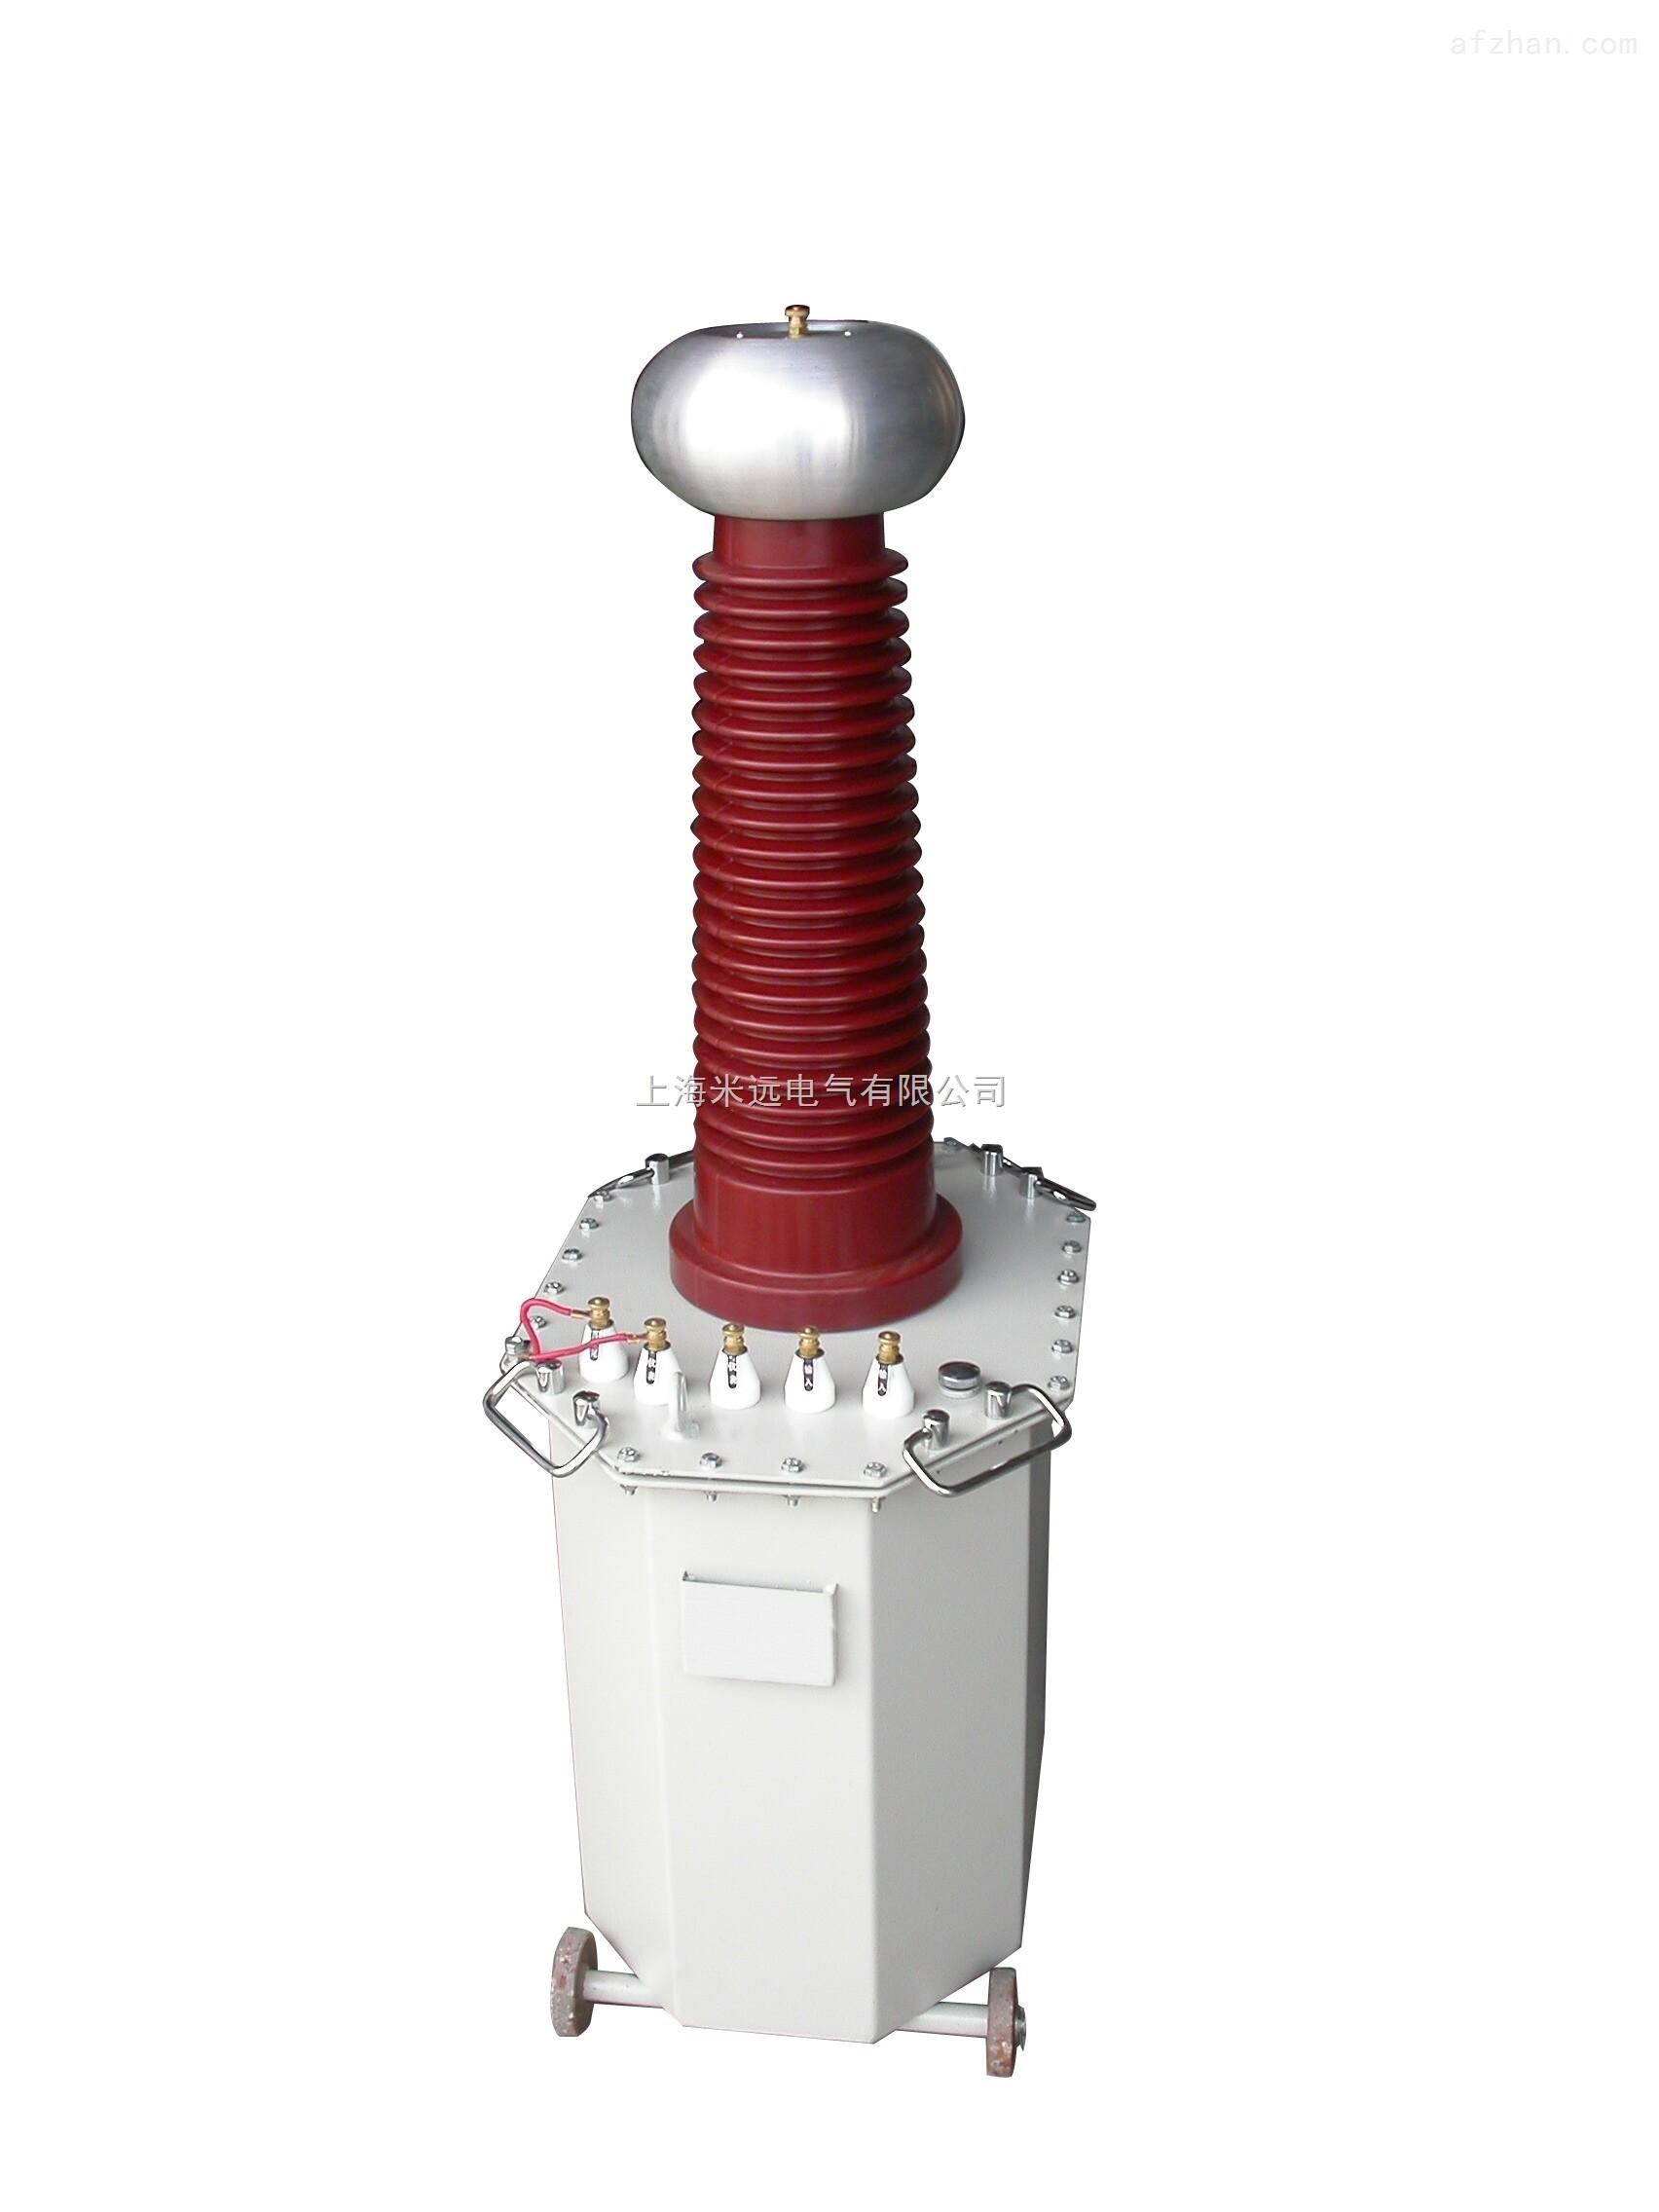 yd-6/5高压试验变压器